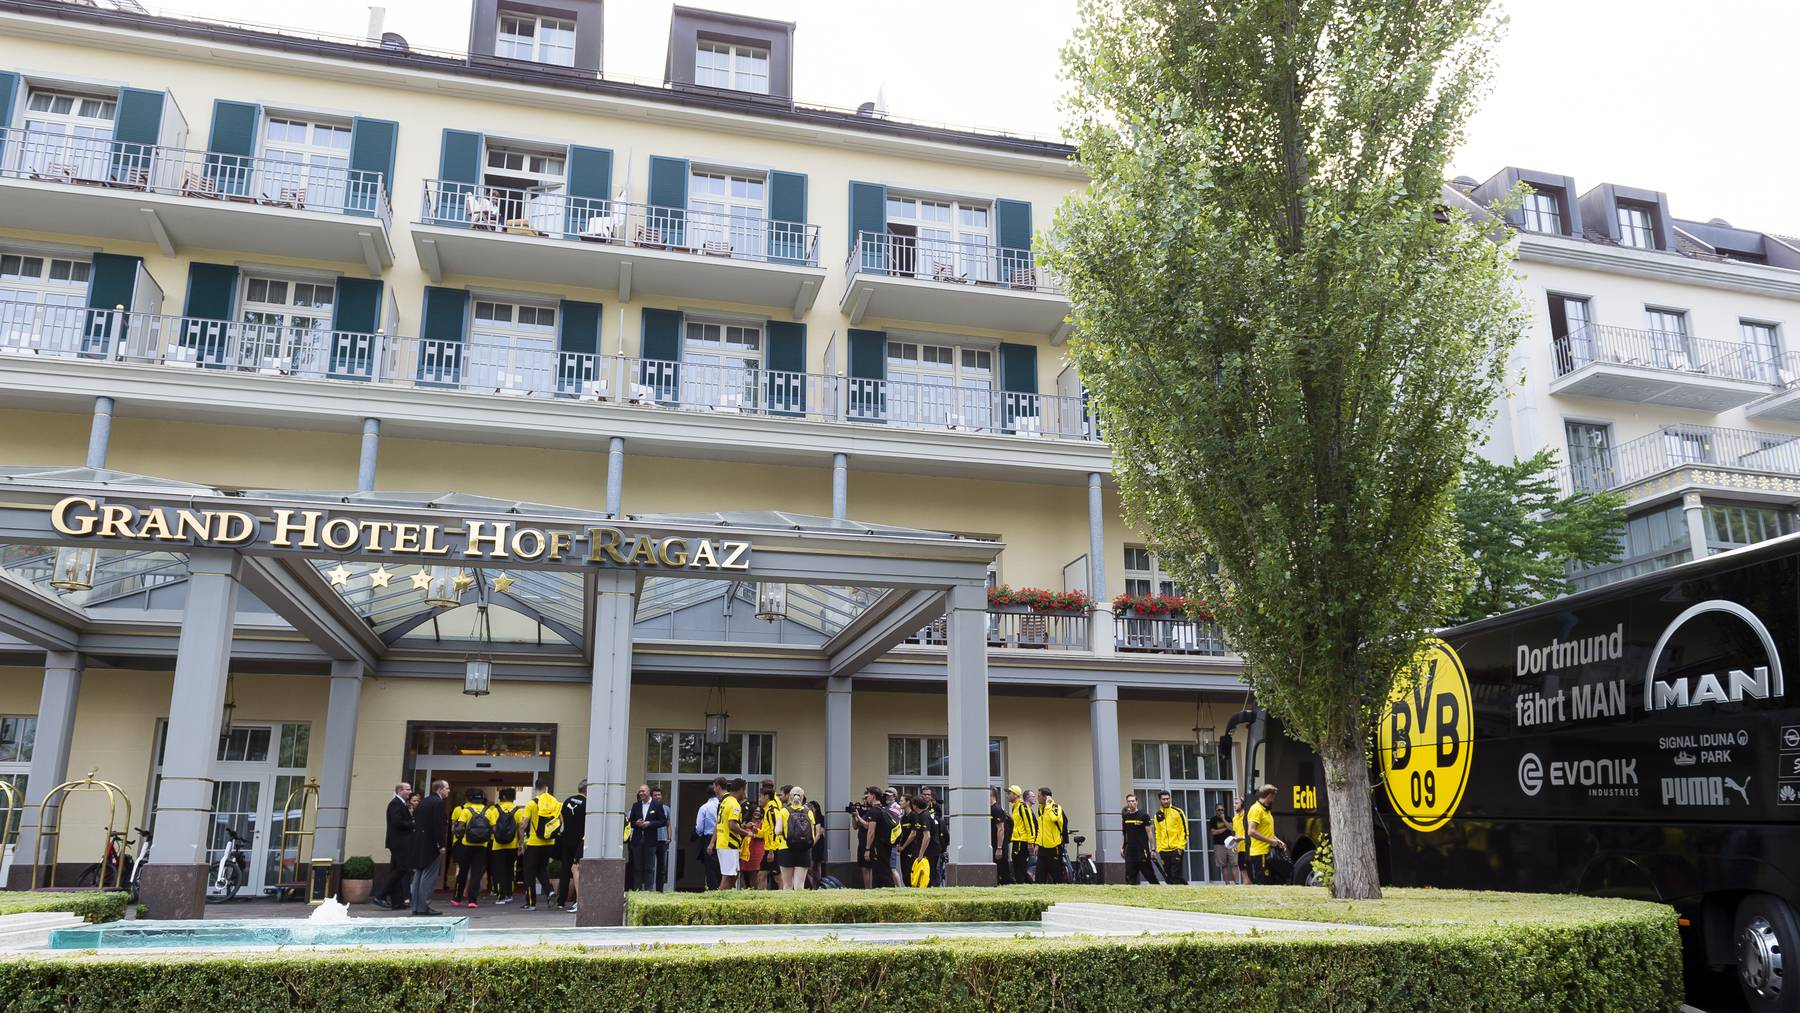 Borussia Dortmund im Grand Hotel in Bad Ragaz